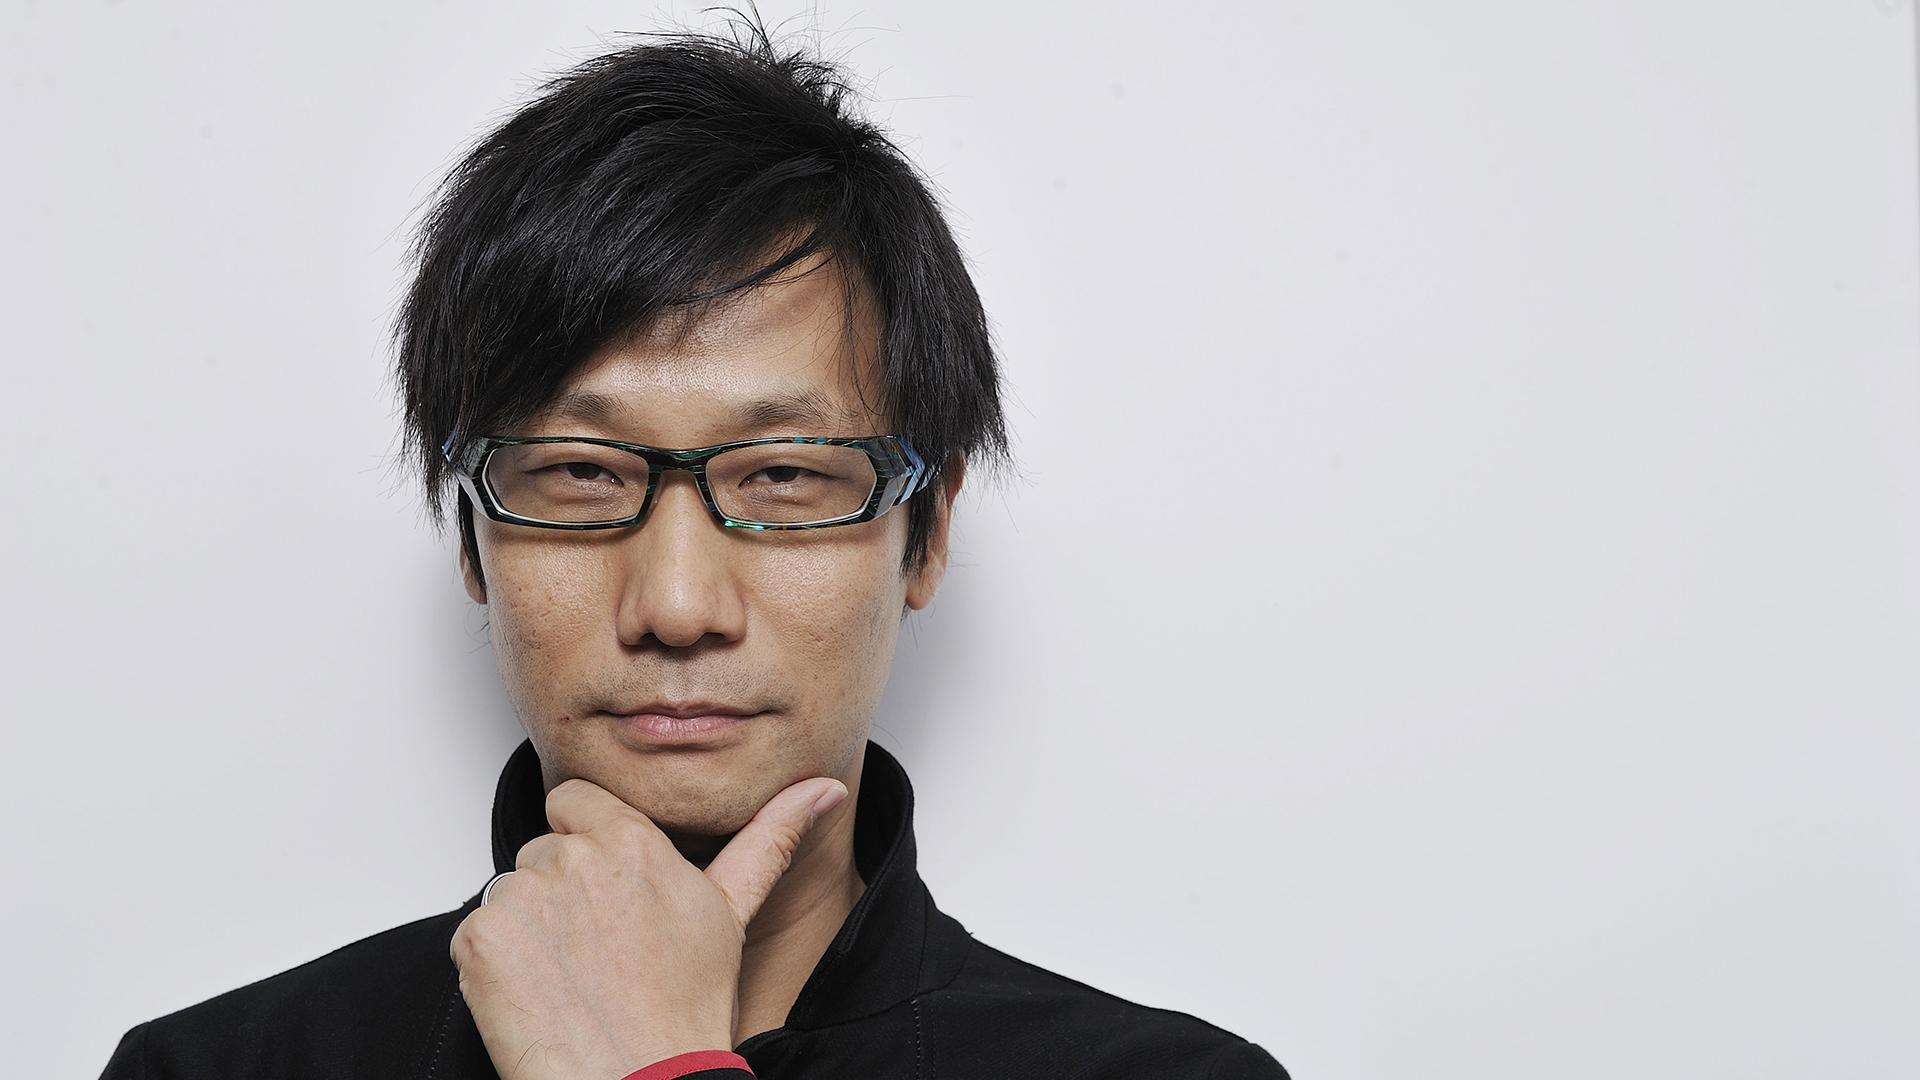 Хидео Кодзима попал в «Книгу рекордов Гинесса»